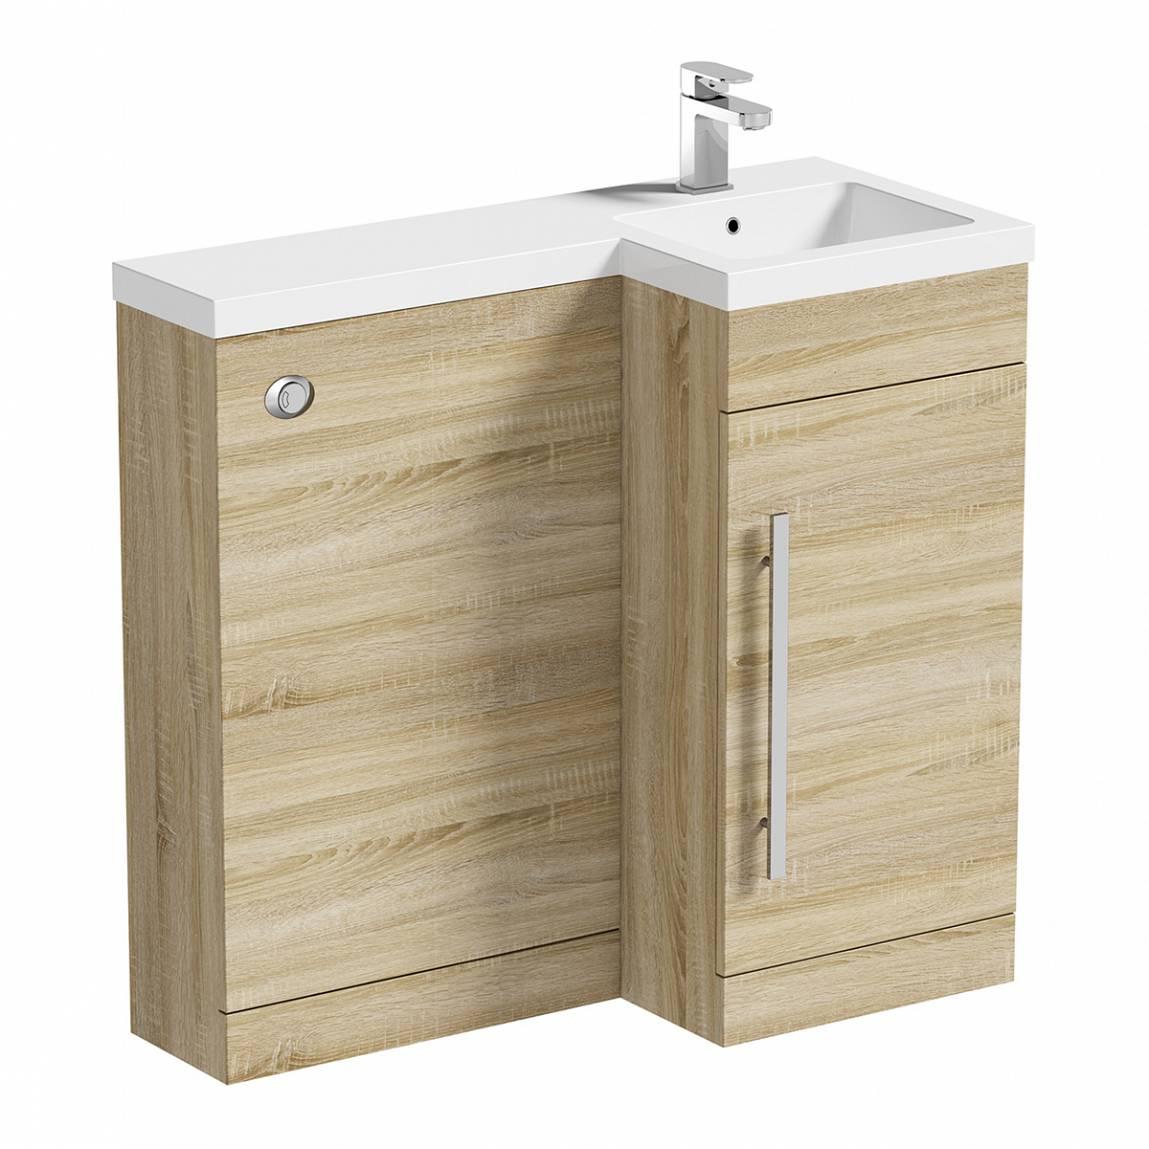 Image of MySpace Oak Combination Unit RH including Concealed Cistern